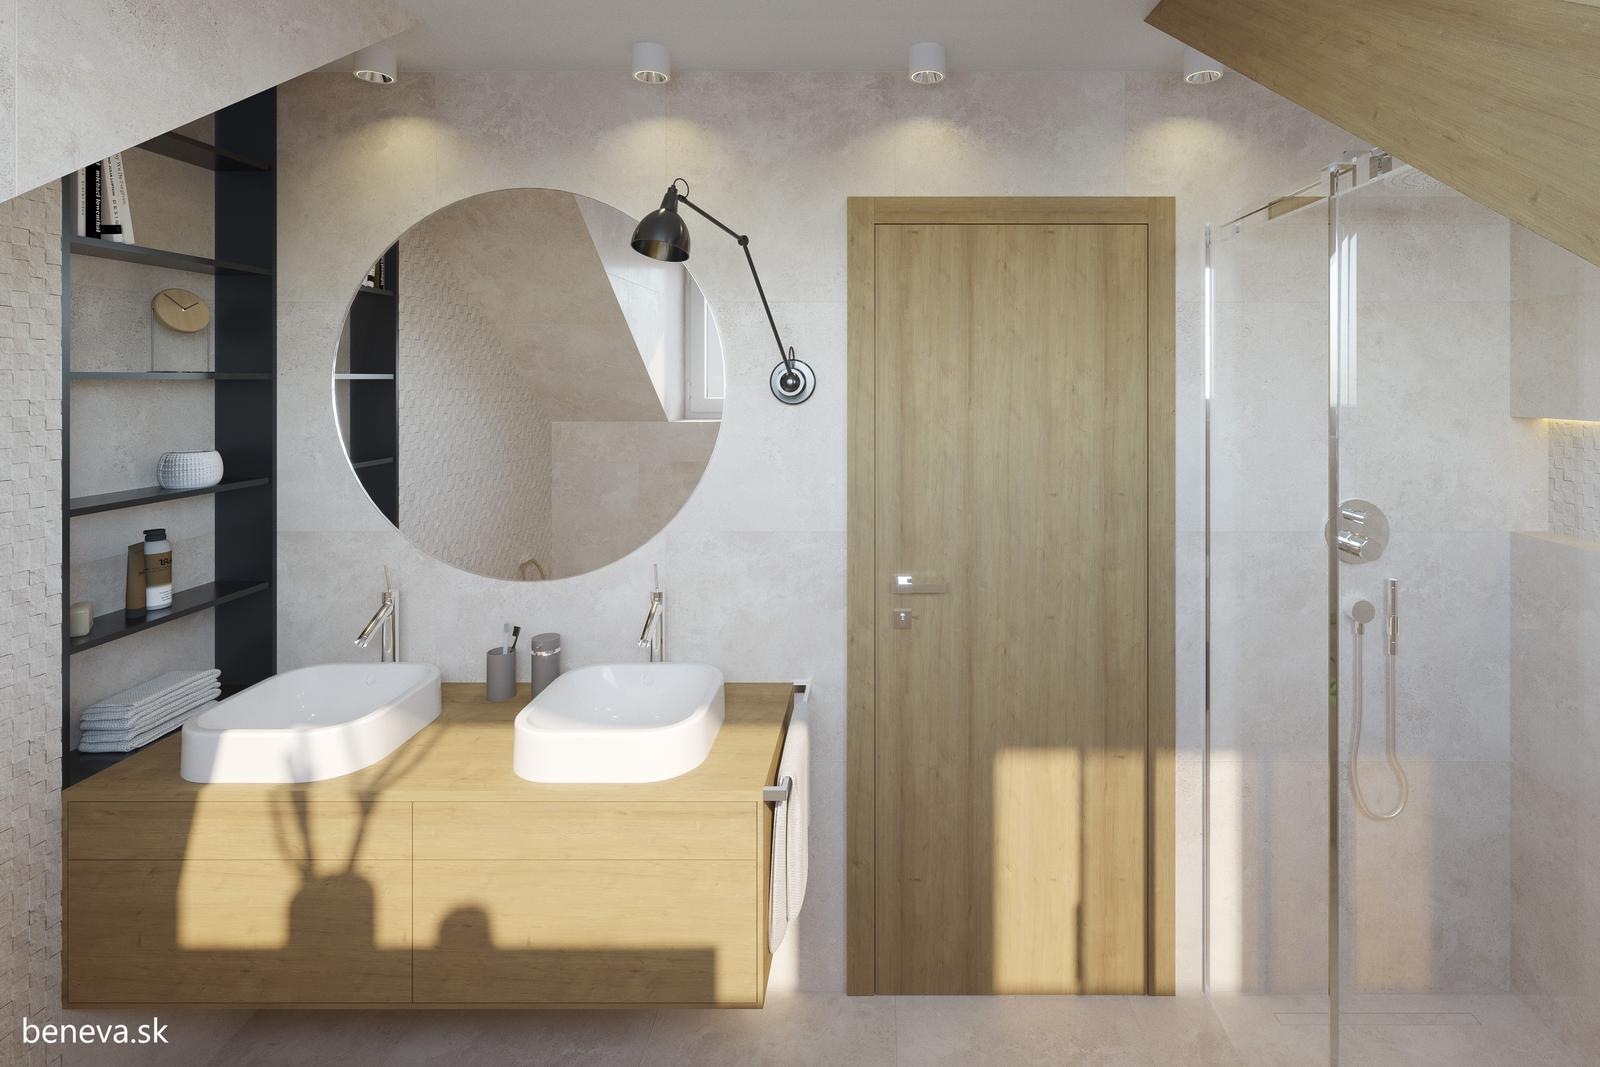 3D návrhy kúpeľní / Vizualizácie - Moderná kúpeľňa v podkroví